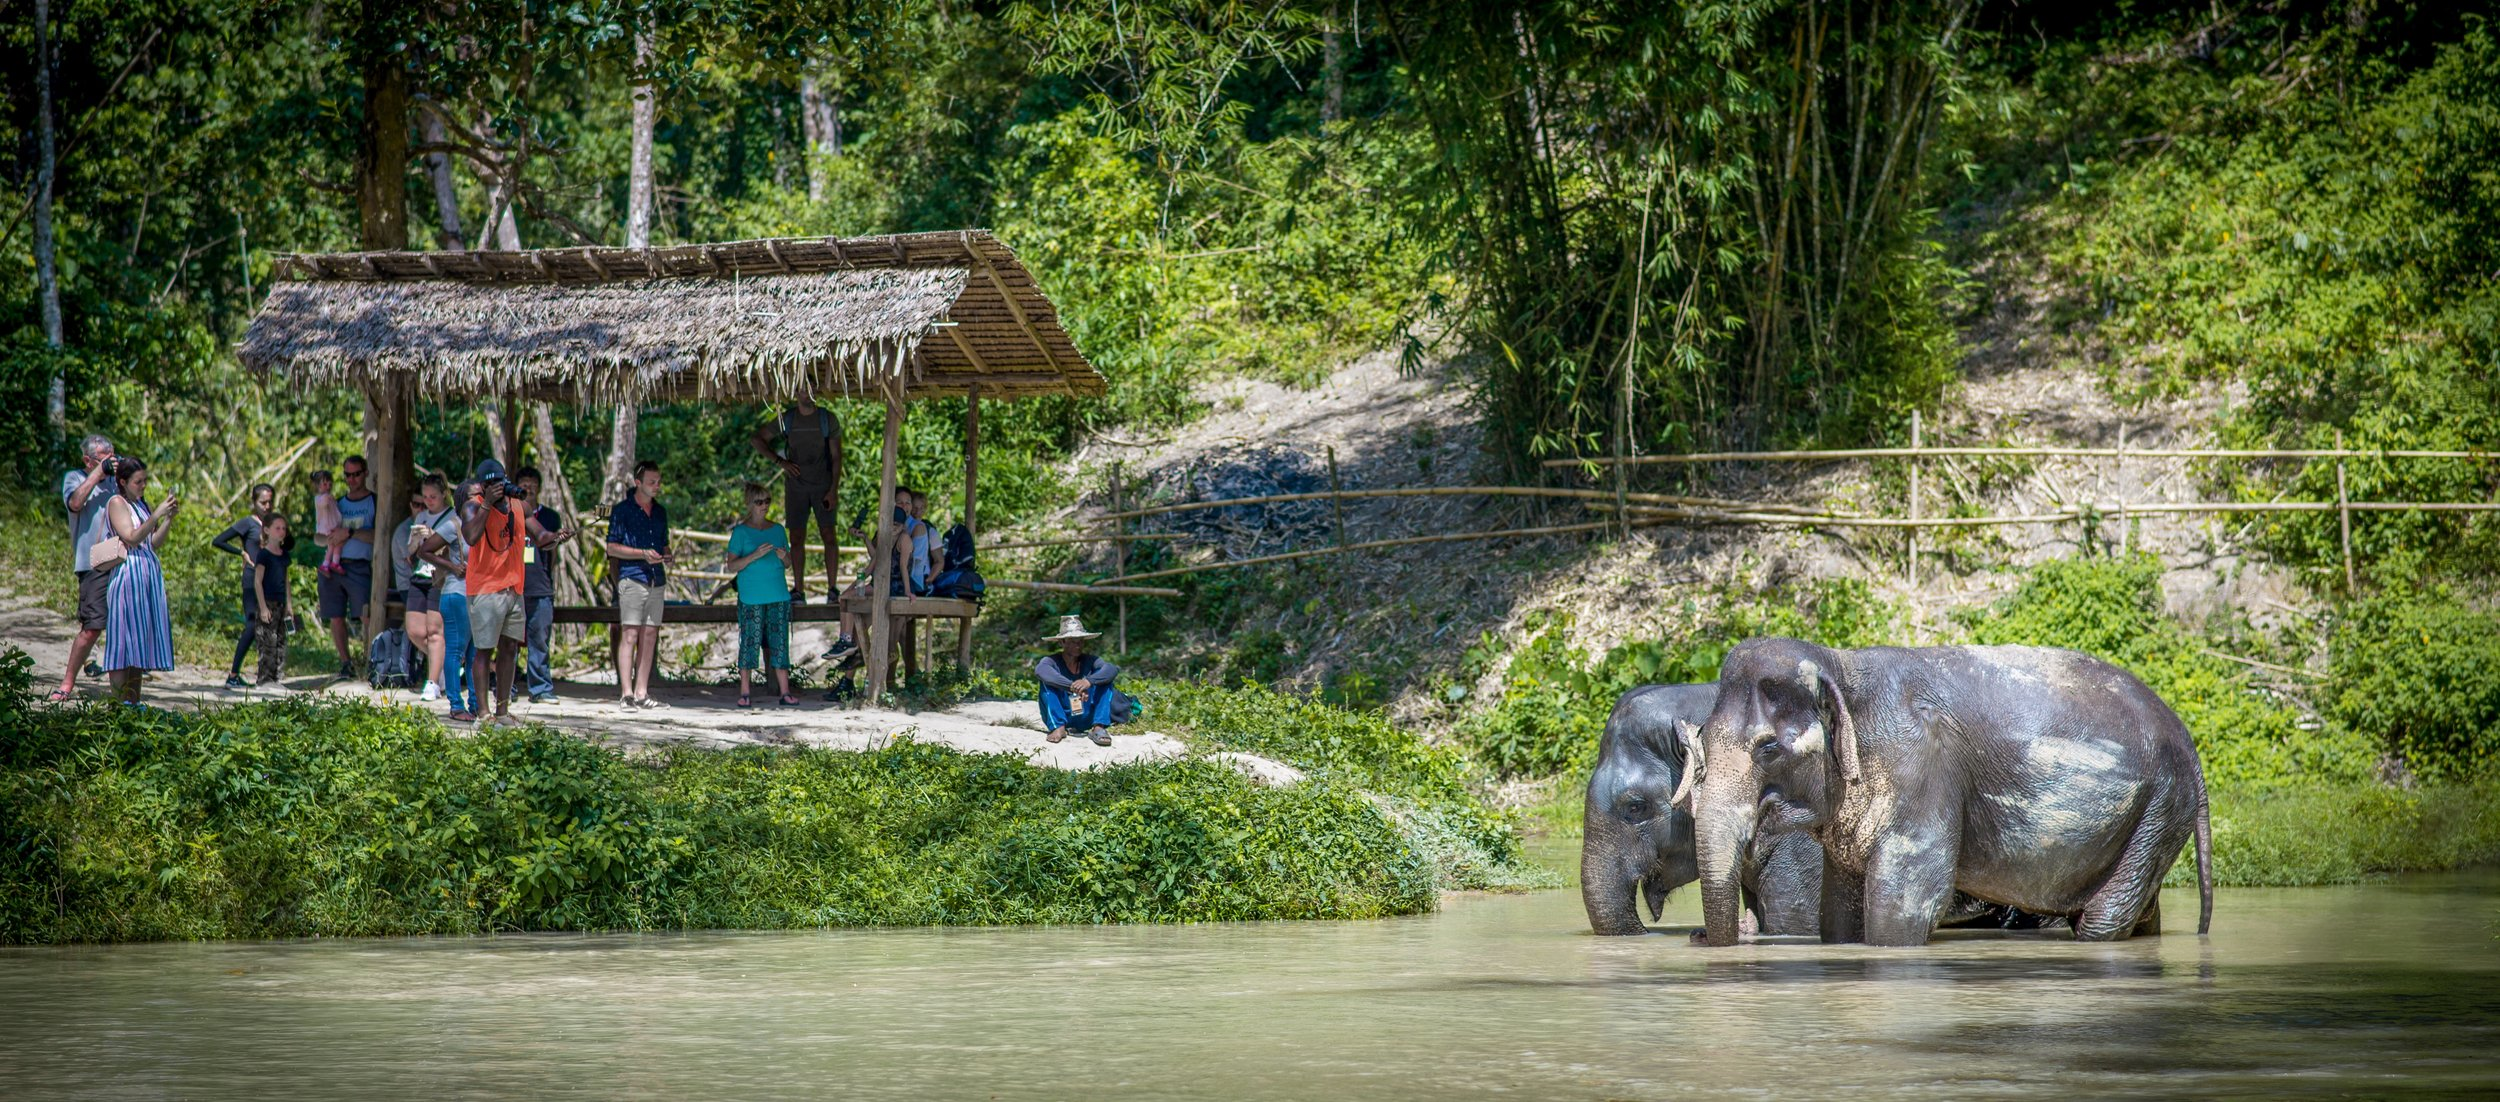 Ekomatkaajat Phuket norsujensuojelu.jpg